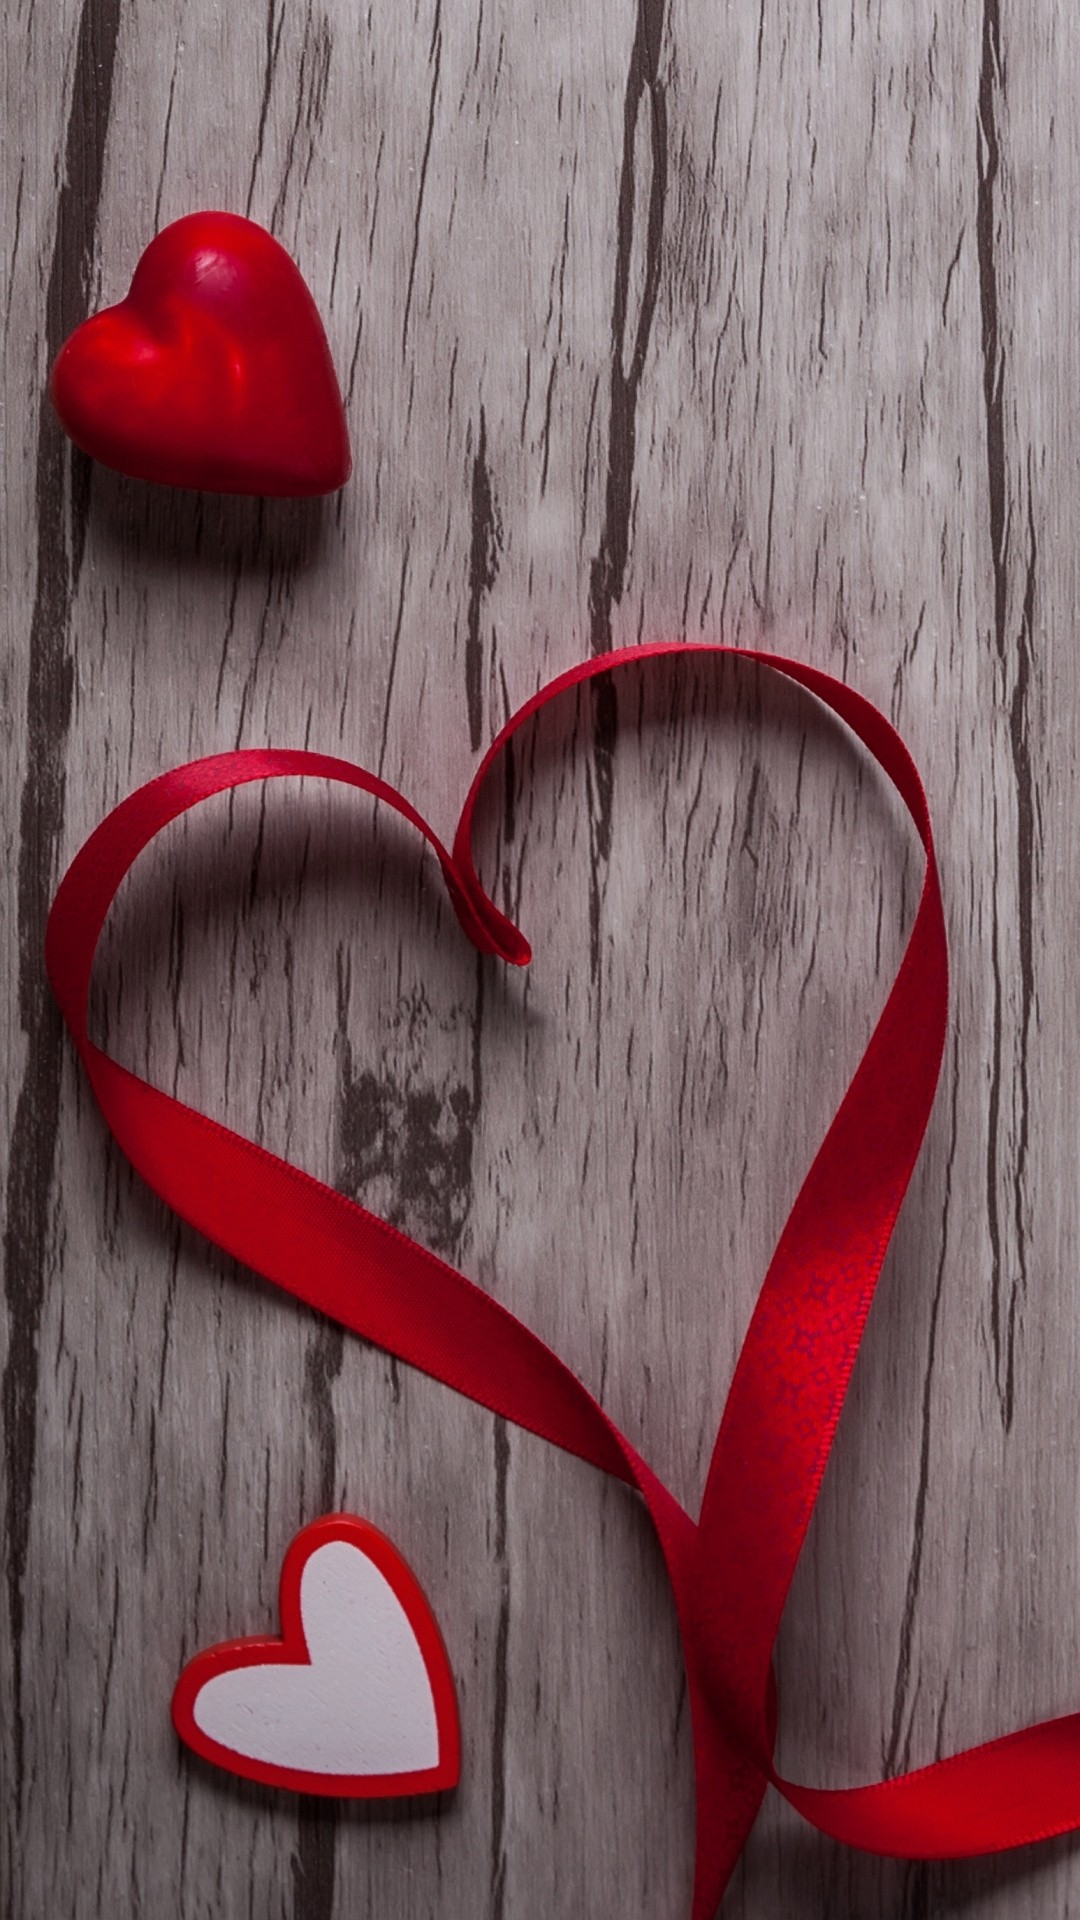 Valentines iphone wallpaper